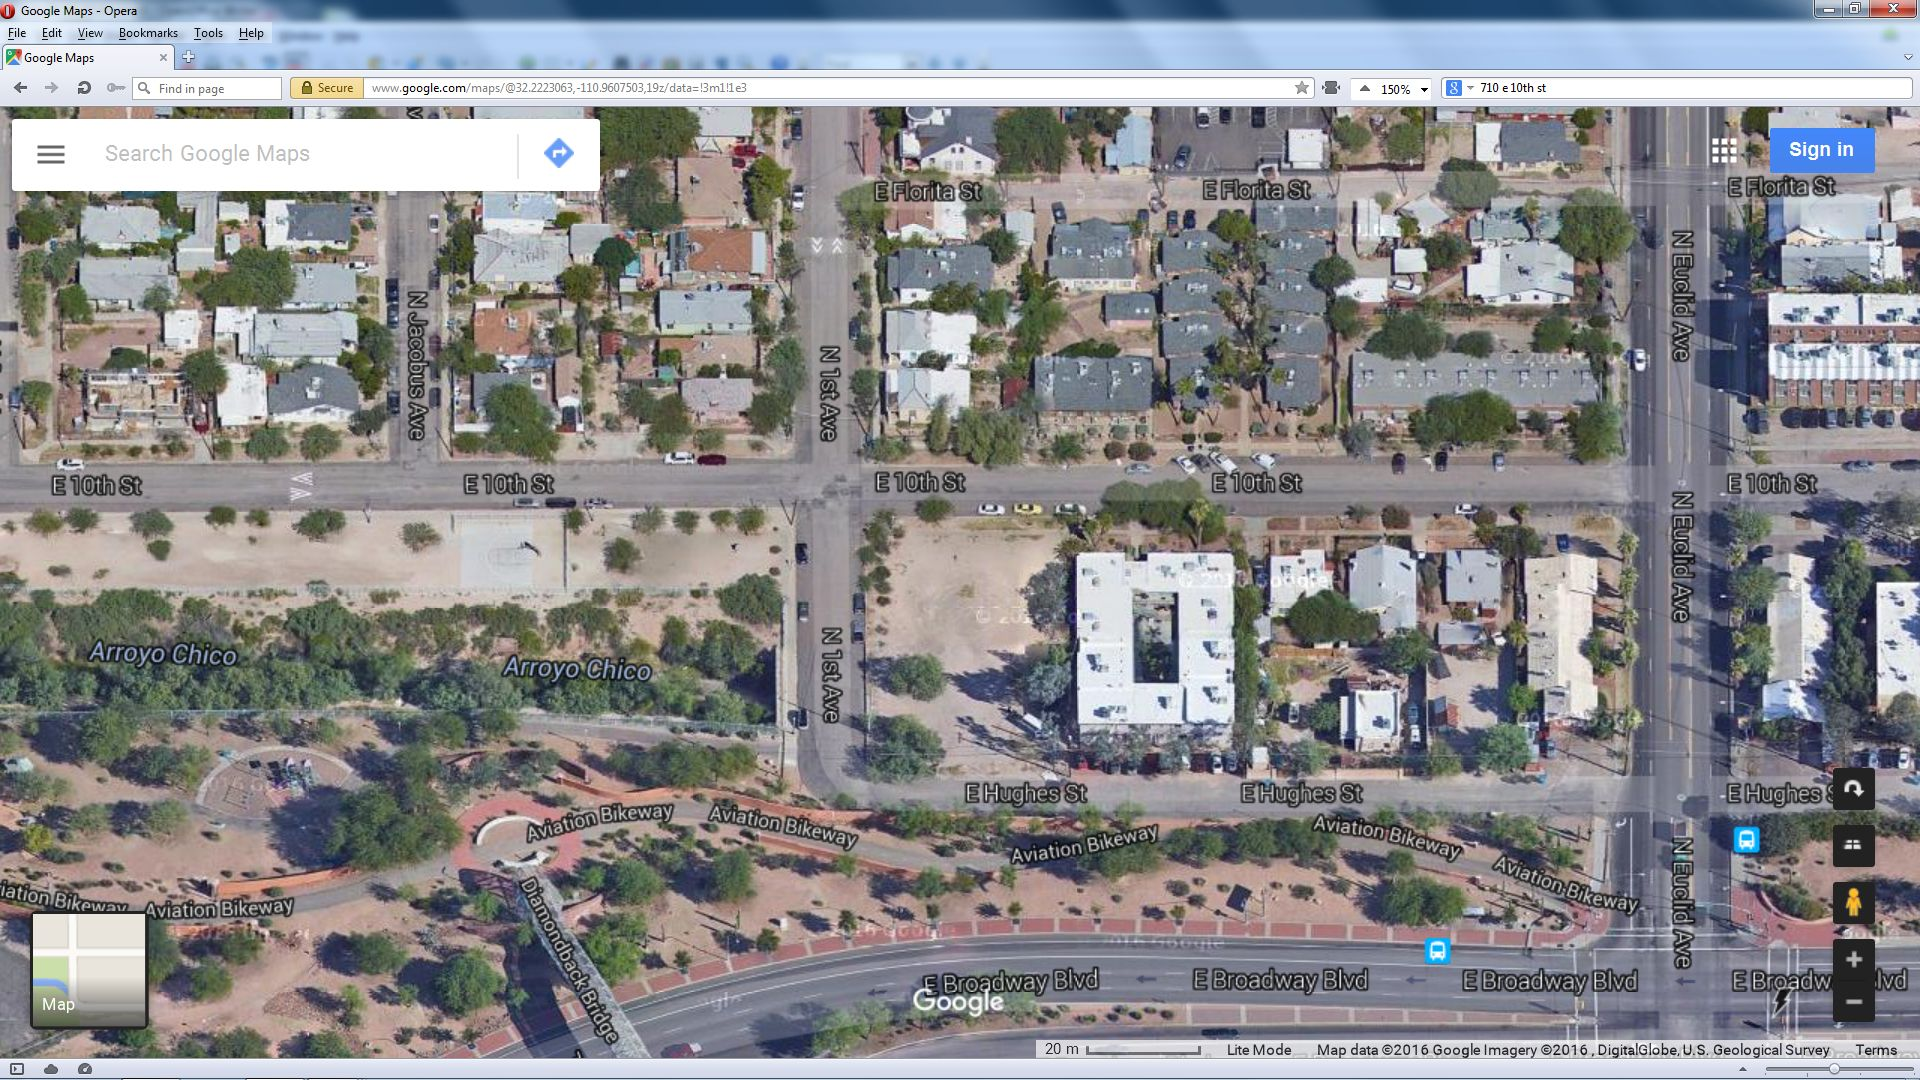 Map Uae Google%0A     E   th St For Sale Tucson AZ Trulia ISyn qf  ius                             E   th St Tucson AZ        Google Maps Tucson Google Maps Tucson